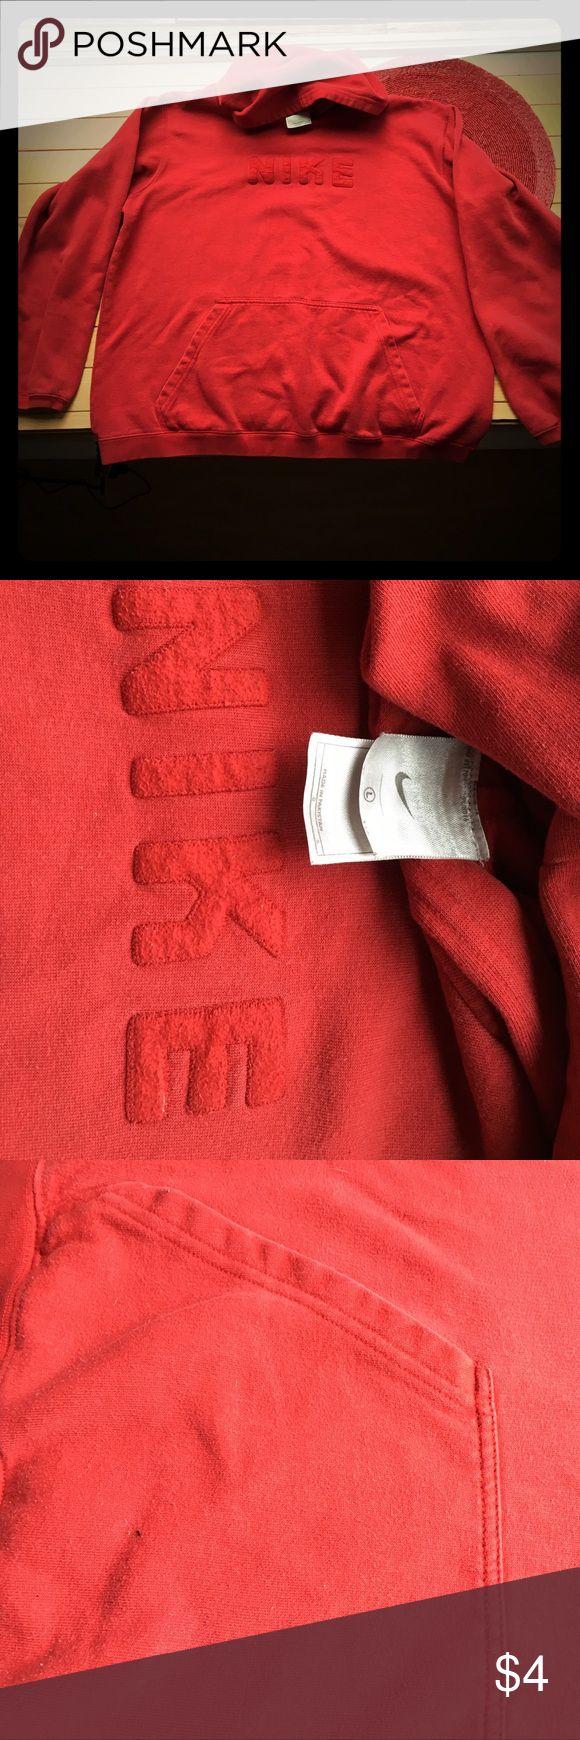 Red Nike hoodie sweatshirt, L (men's) Red Nike hoodie sweatshirt, L (men's), well loved. See photos, prices accordingly Nike Shirts Sweatshirts & Hoodies